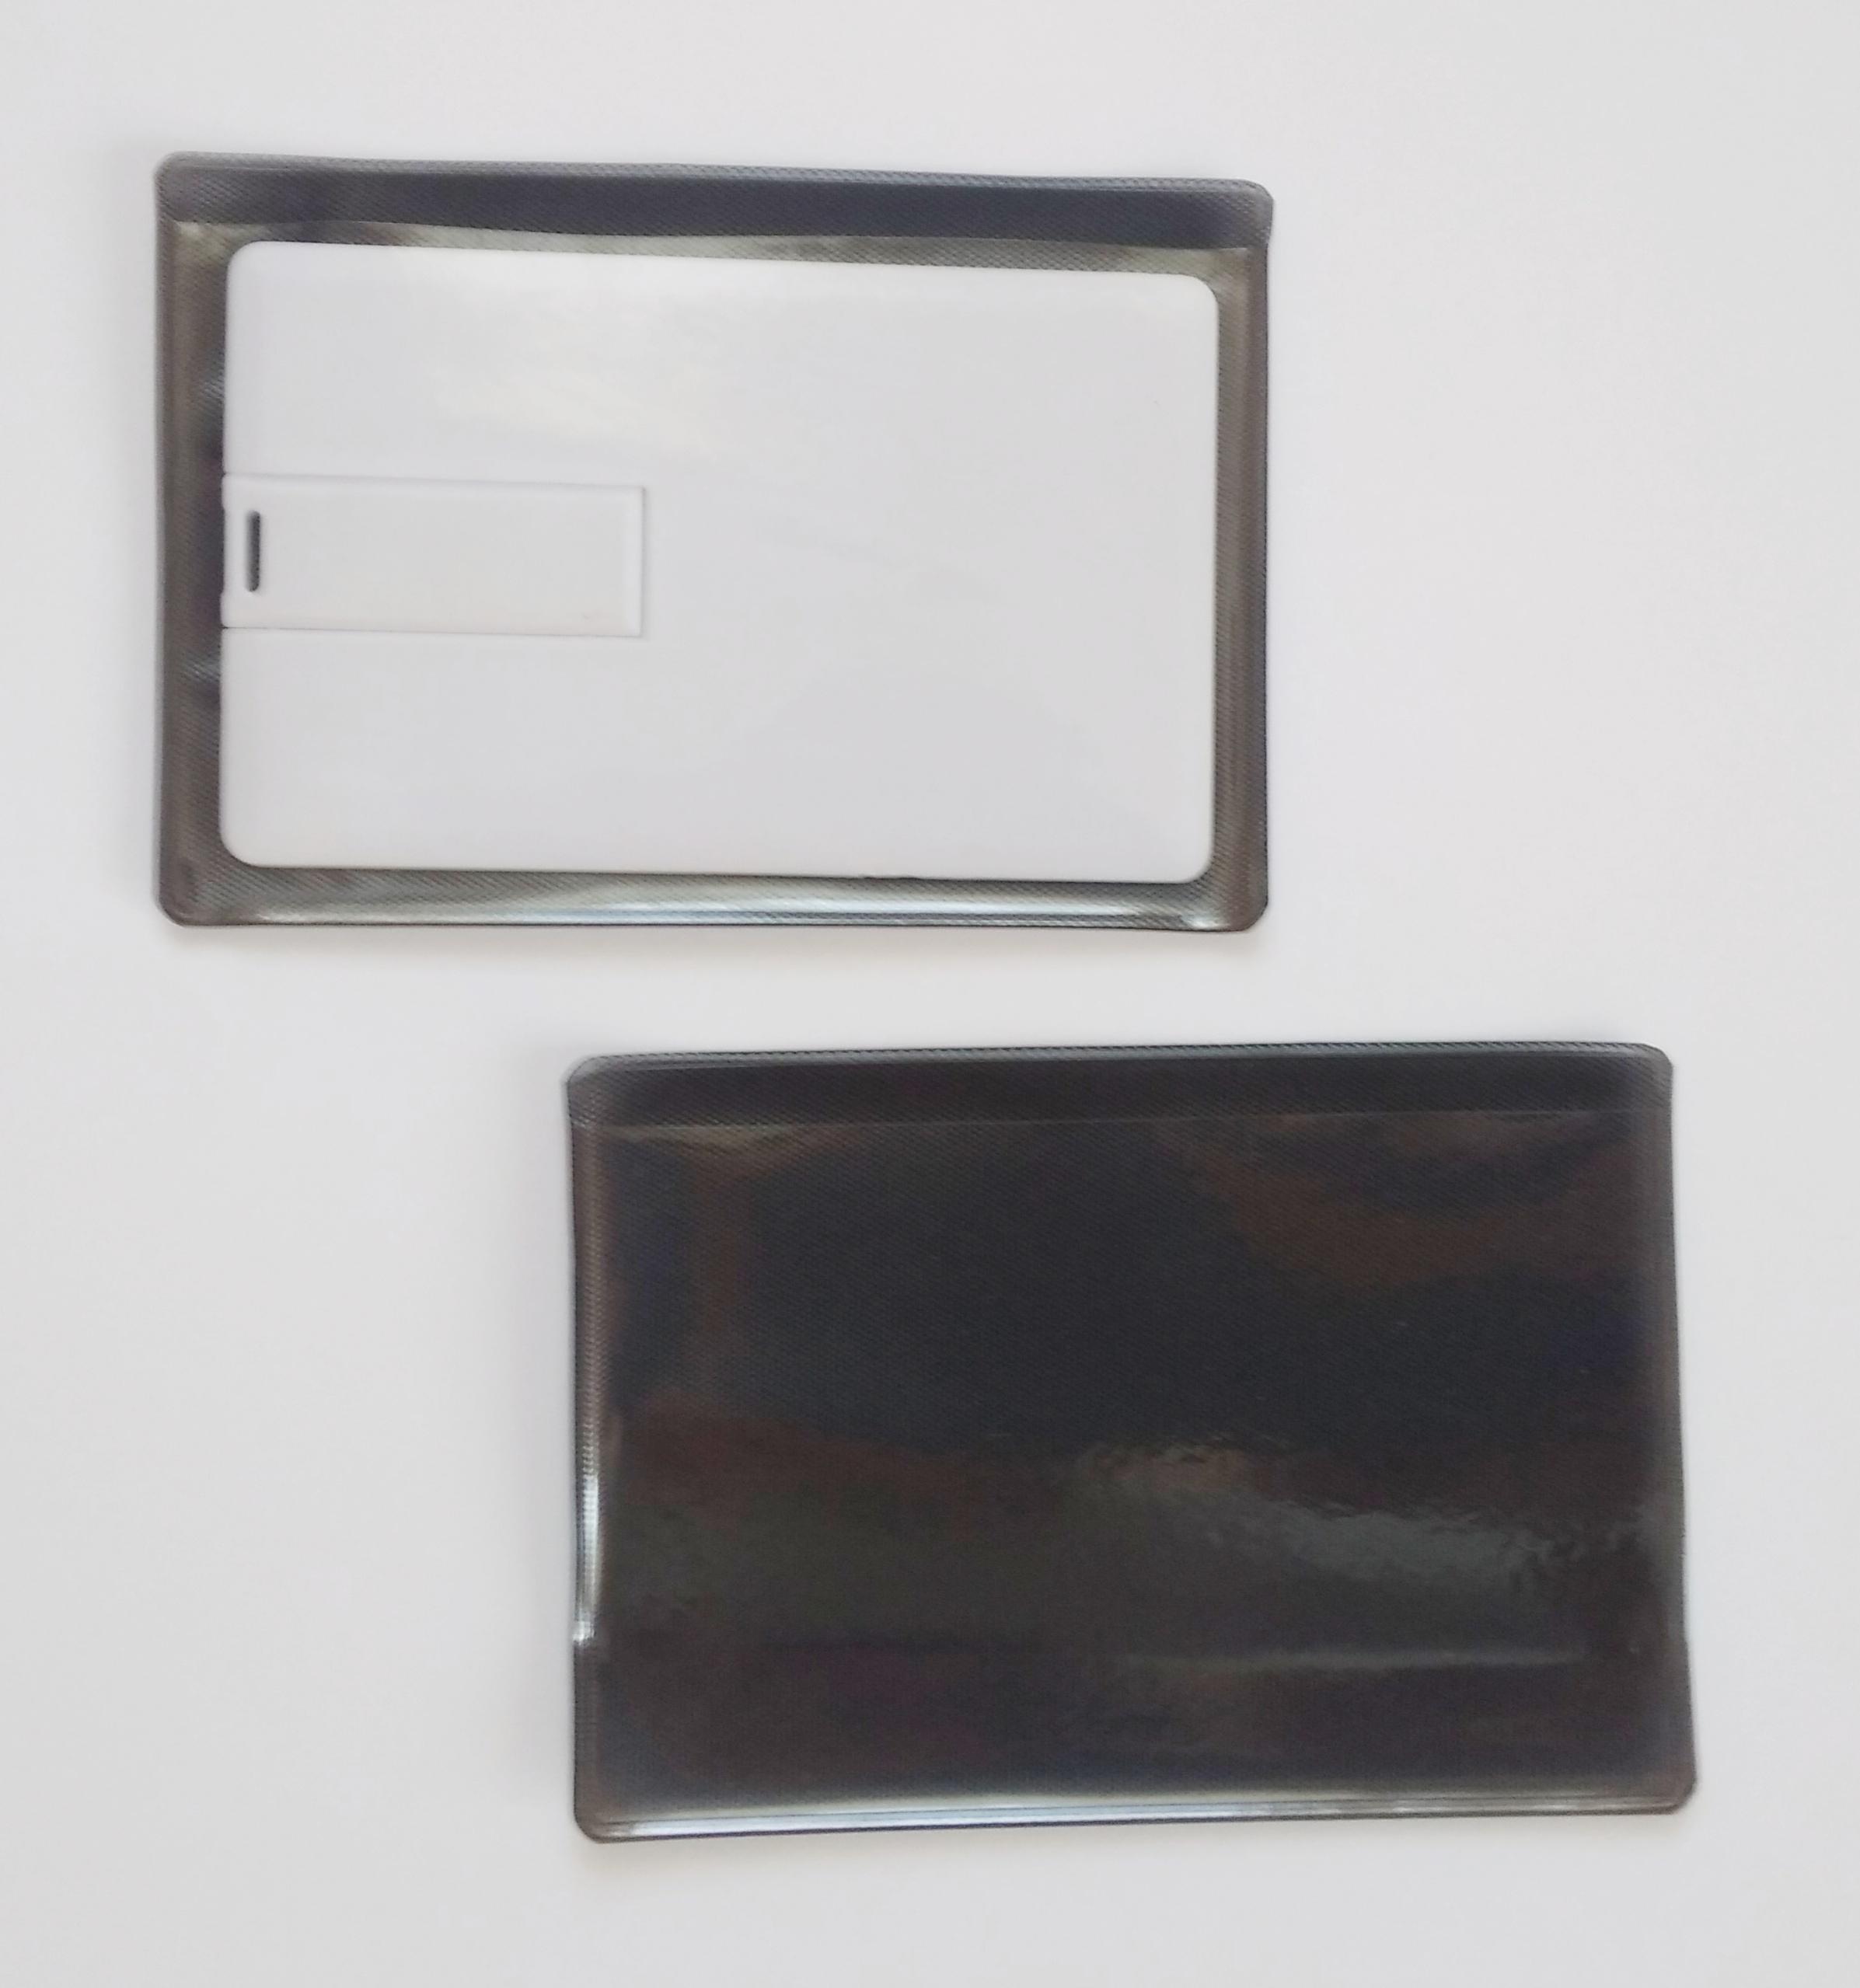 упаковка флешек визиток оптом